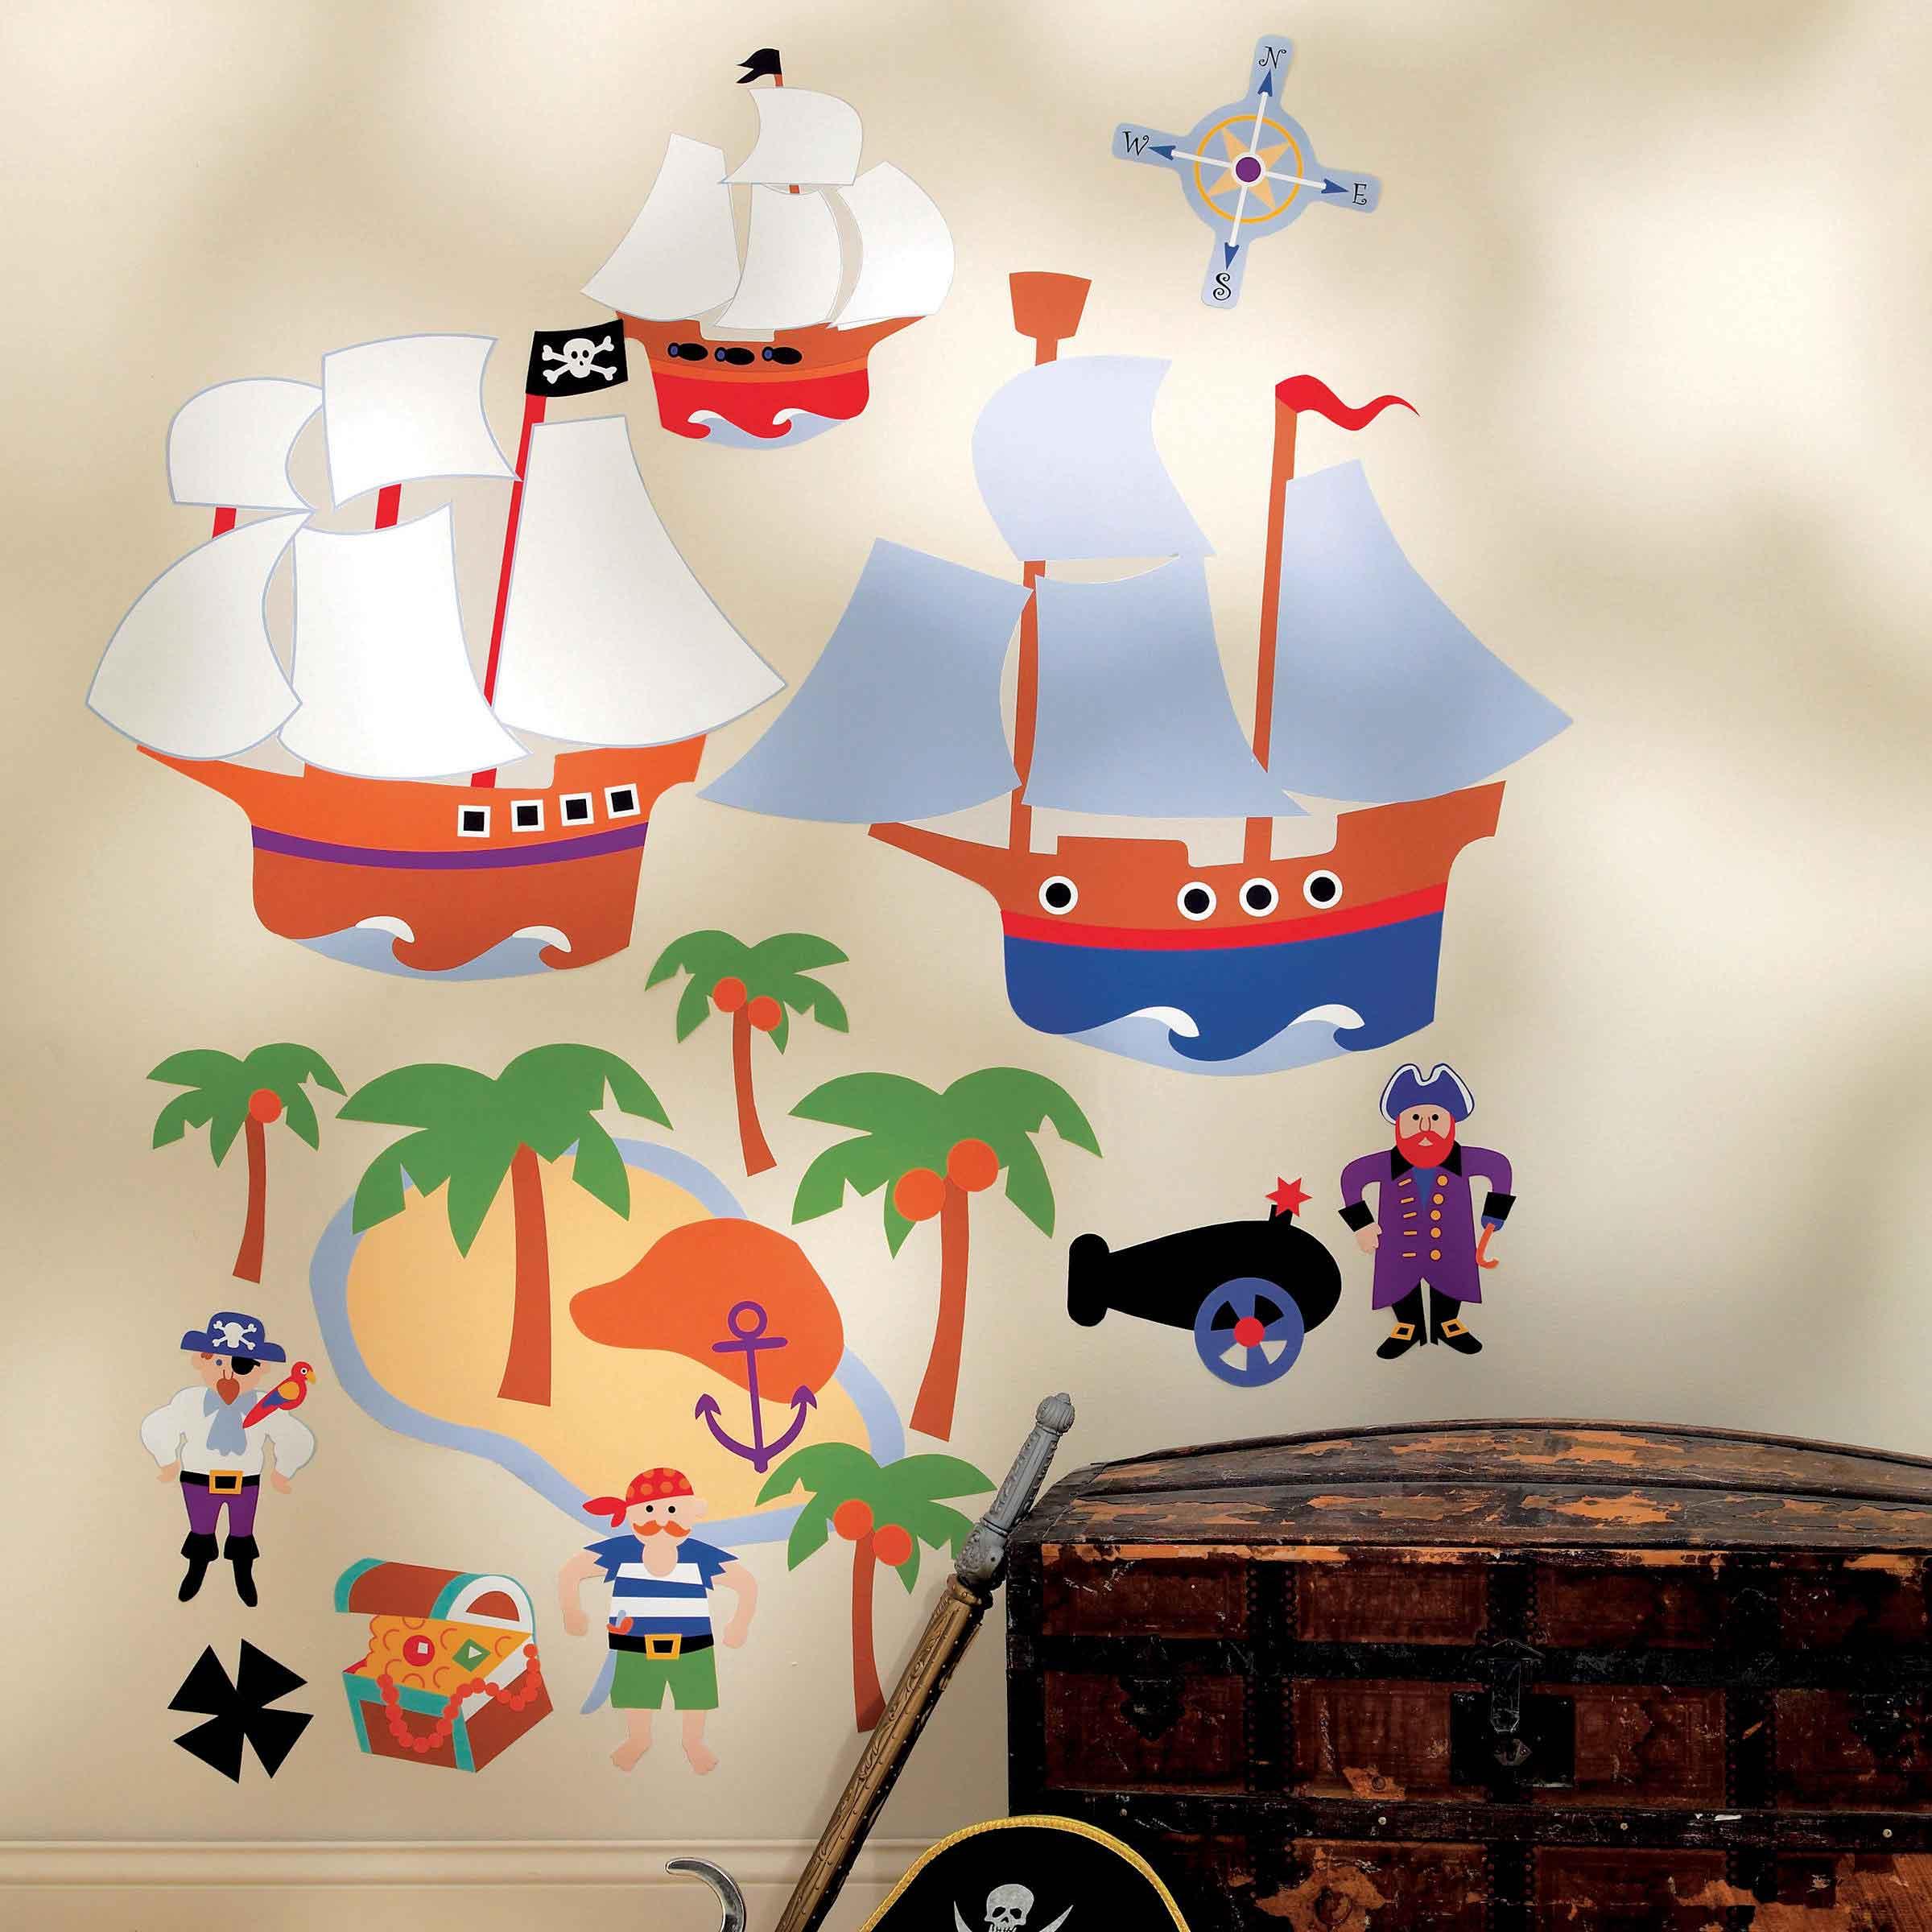 Full Size of Wandsticker Wandbild Piraten Kinderzimmer Regal Weiß Regale Sofa Kinderzimmer Piraten Kinderzimmer